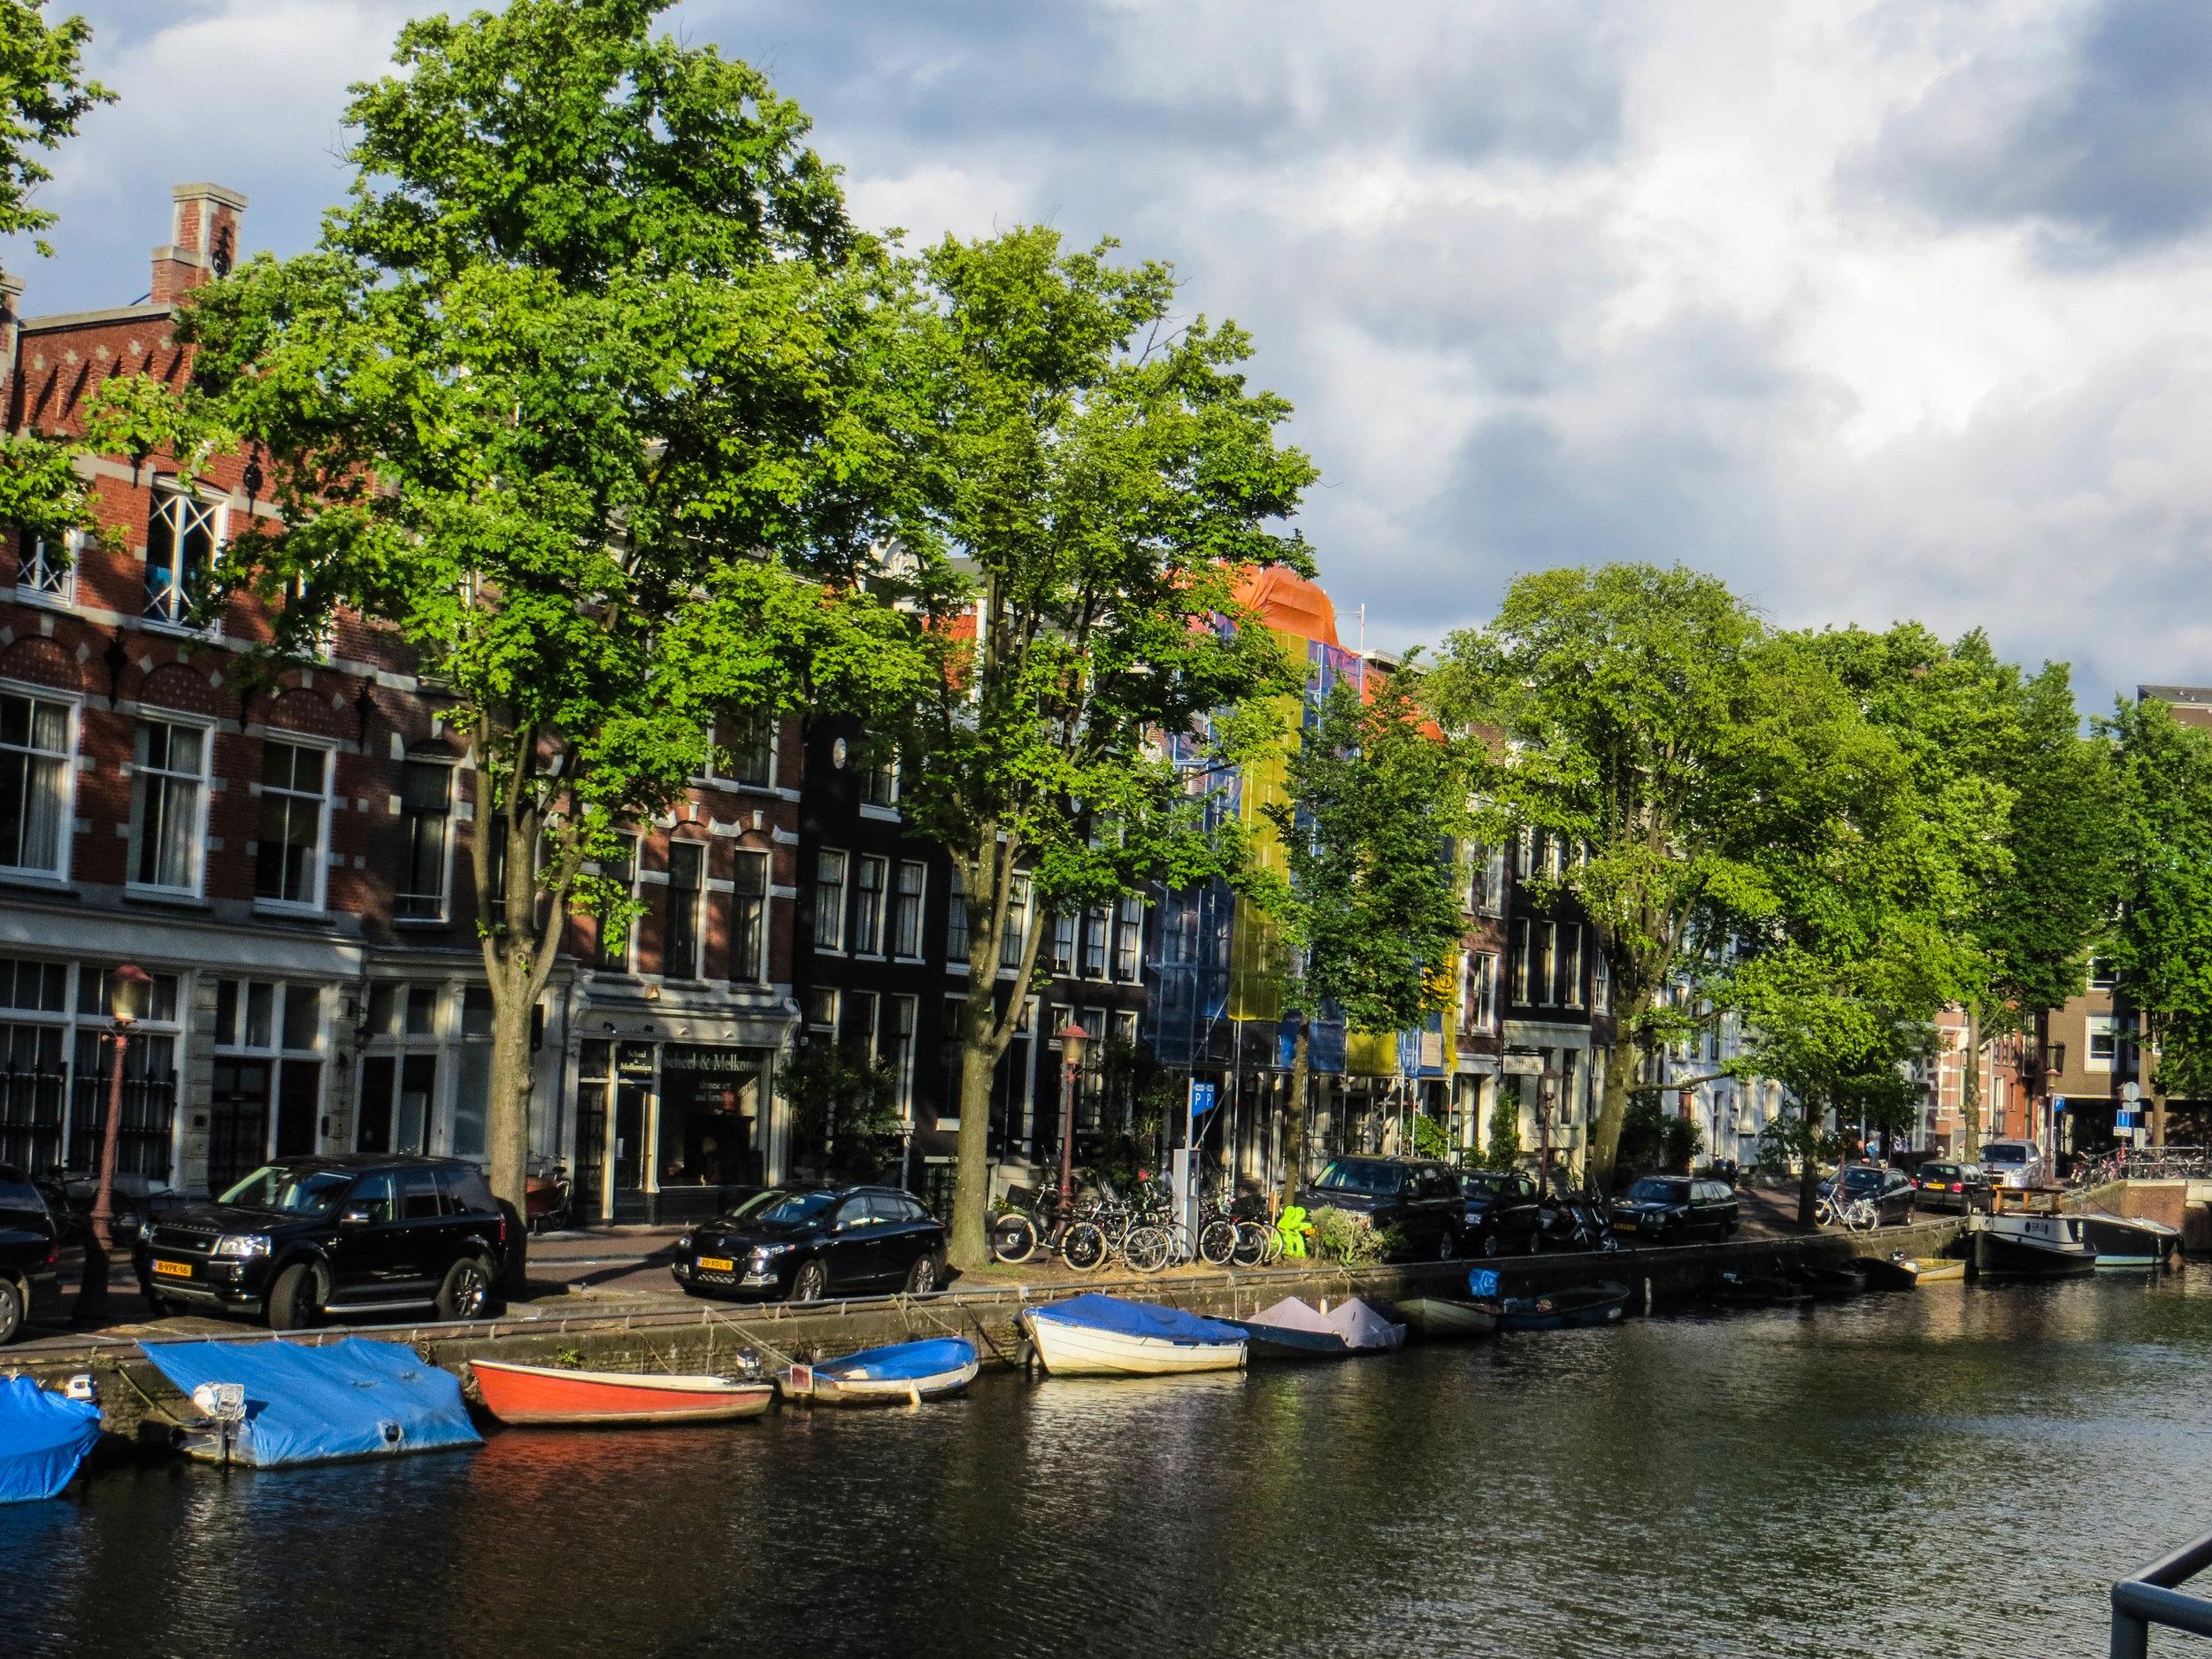 amsterdam-netherlands-street-photography-34.jpg